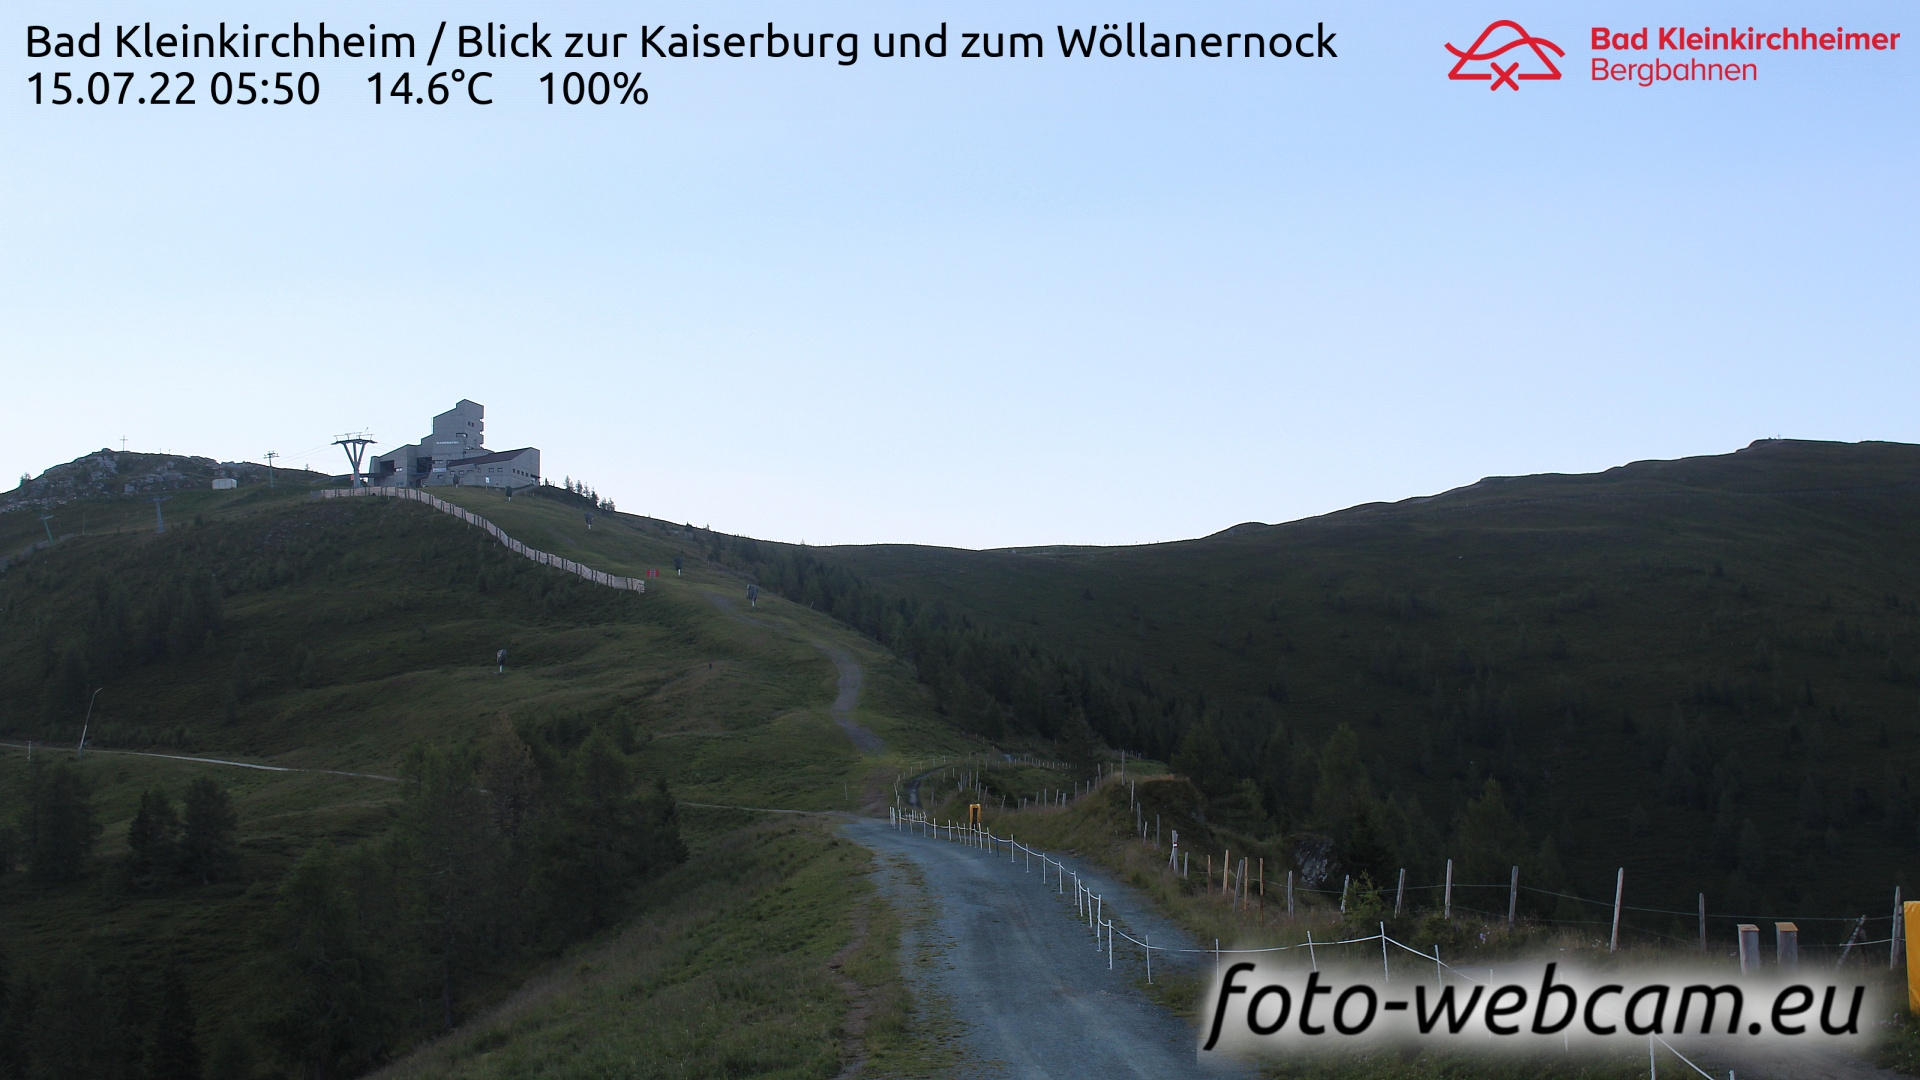 Bad Kleinkirchheim Thu. 05:23